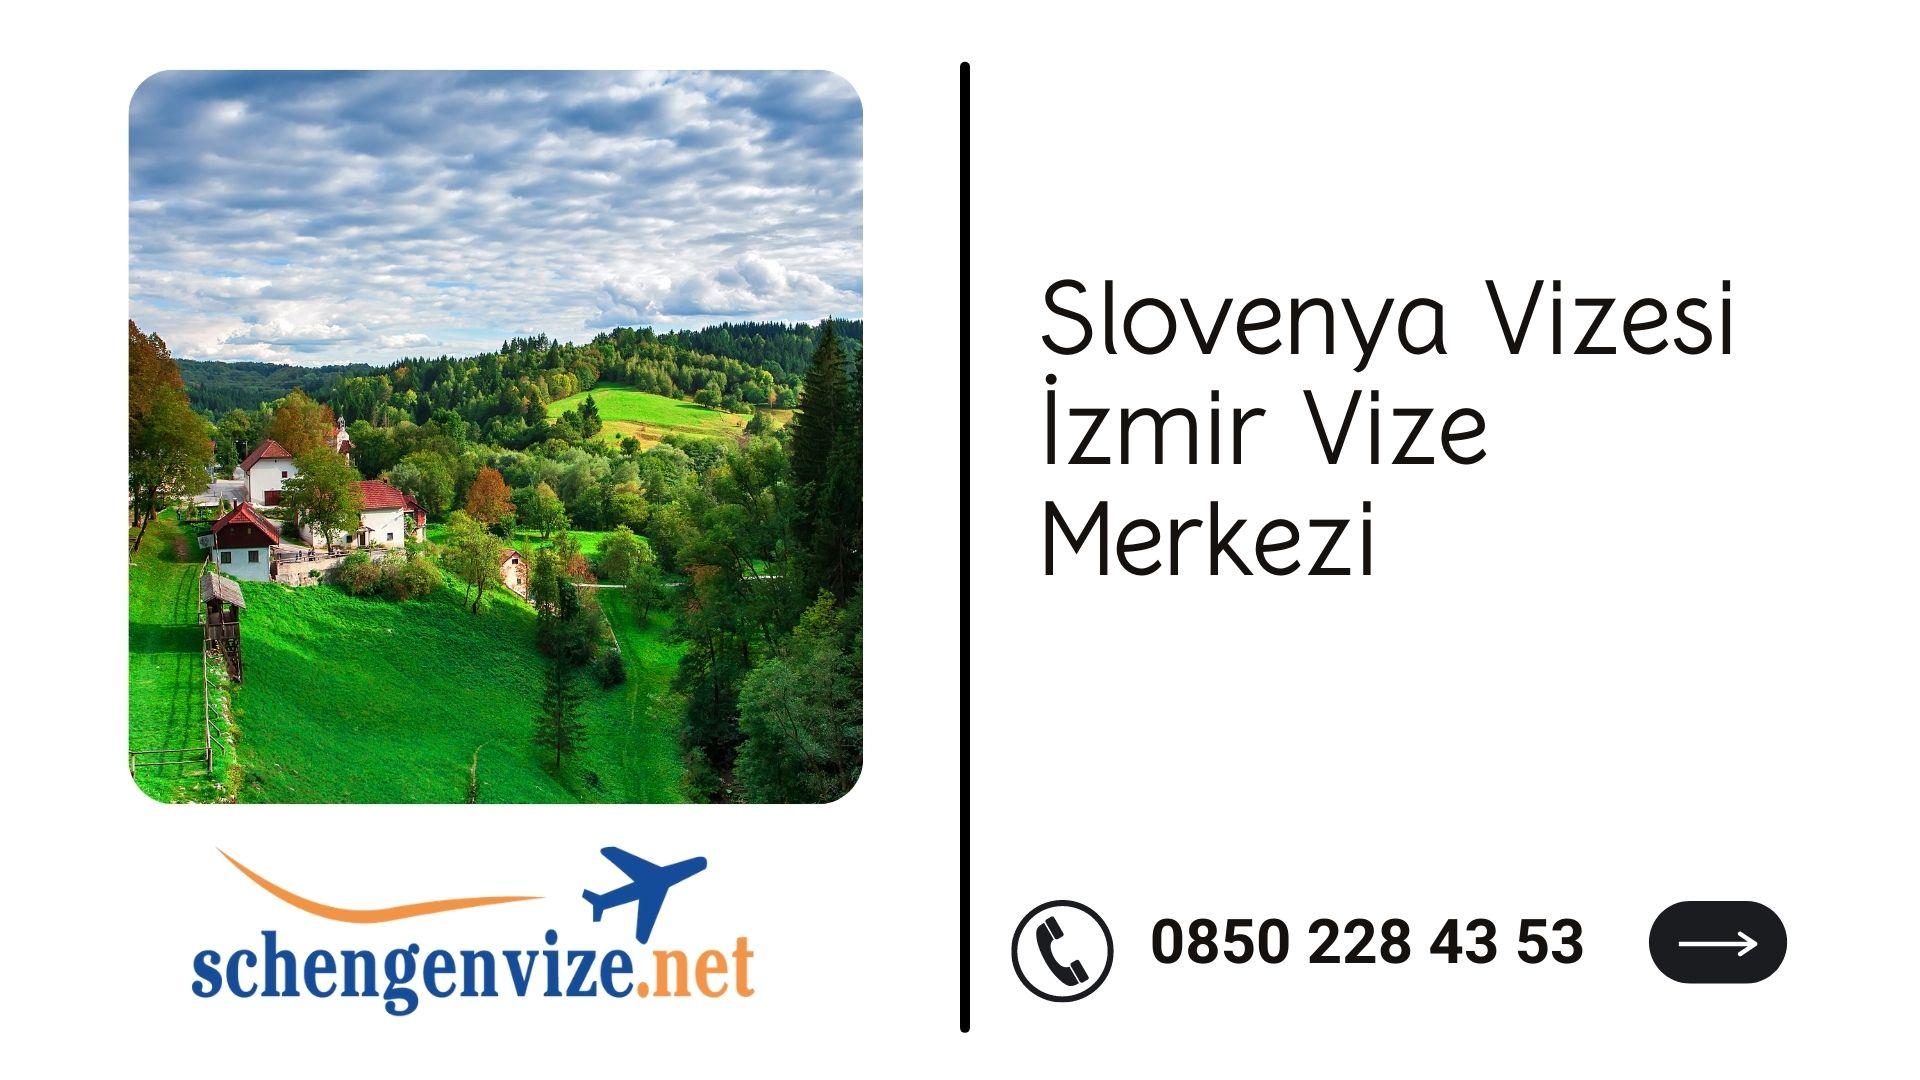 Slovenya Vizesi İzmir Vize Merkezi